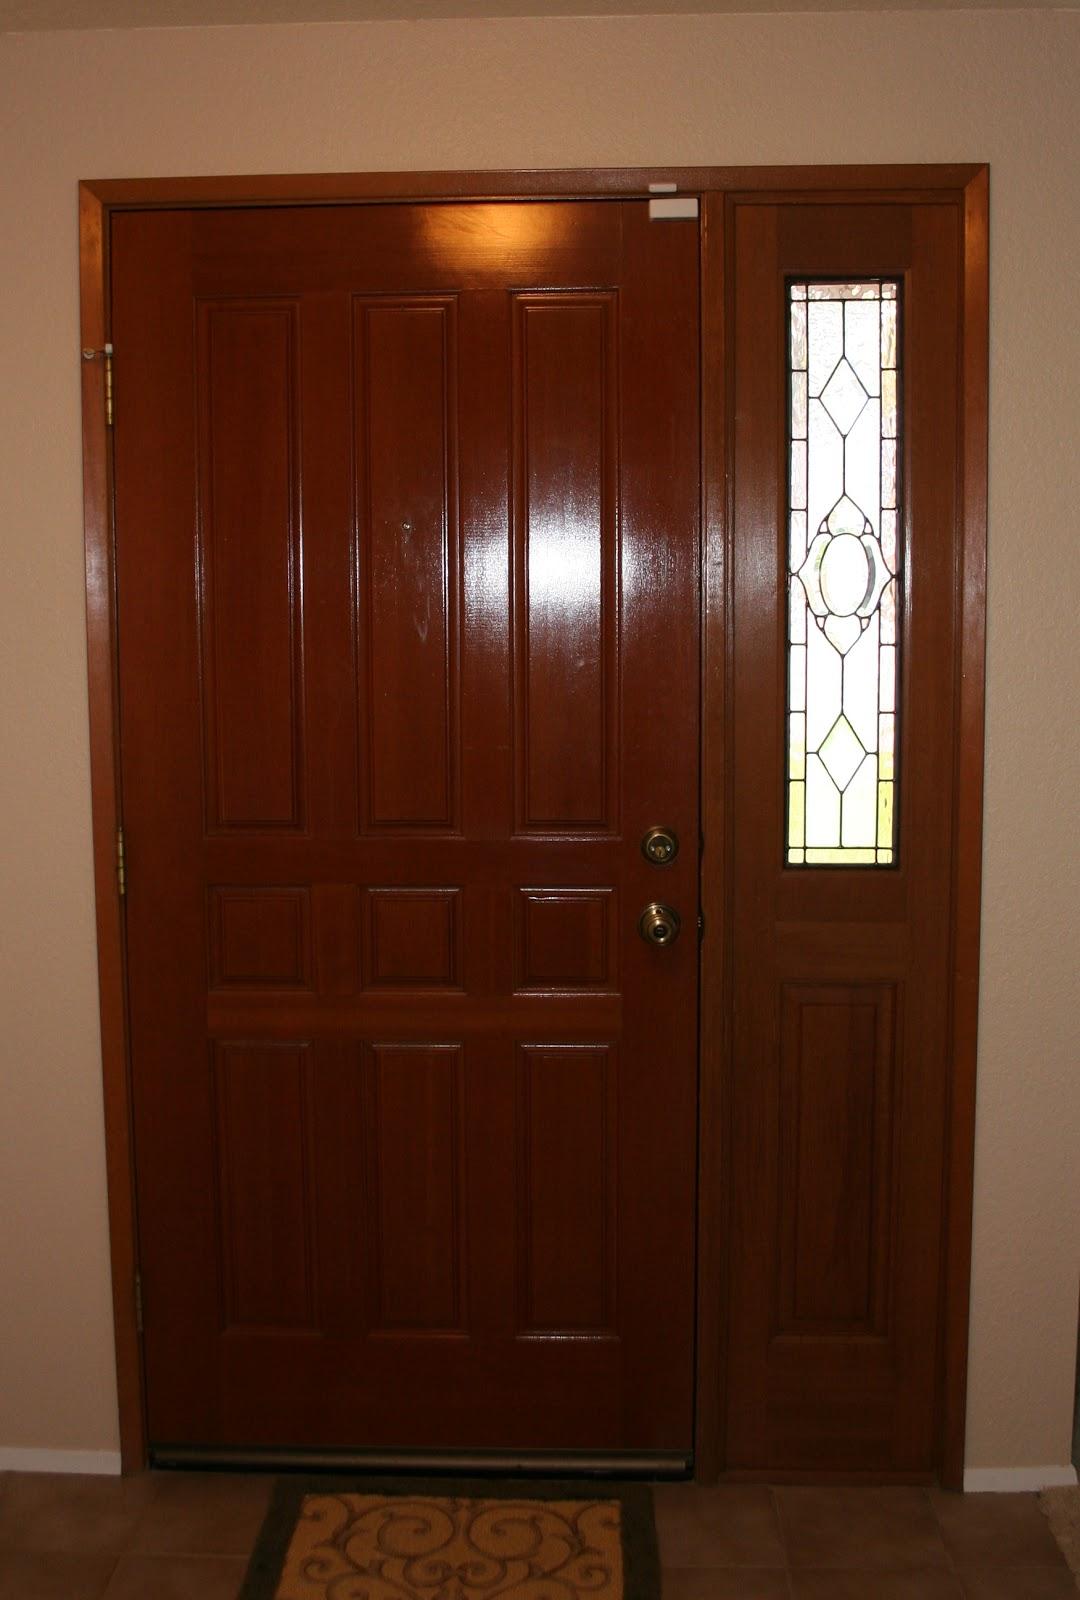 Inside front door clipart - Inside Front Door Clipart Inside Front Door Its